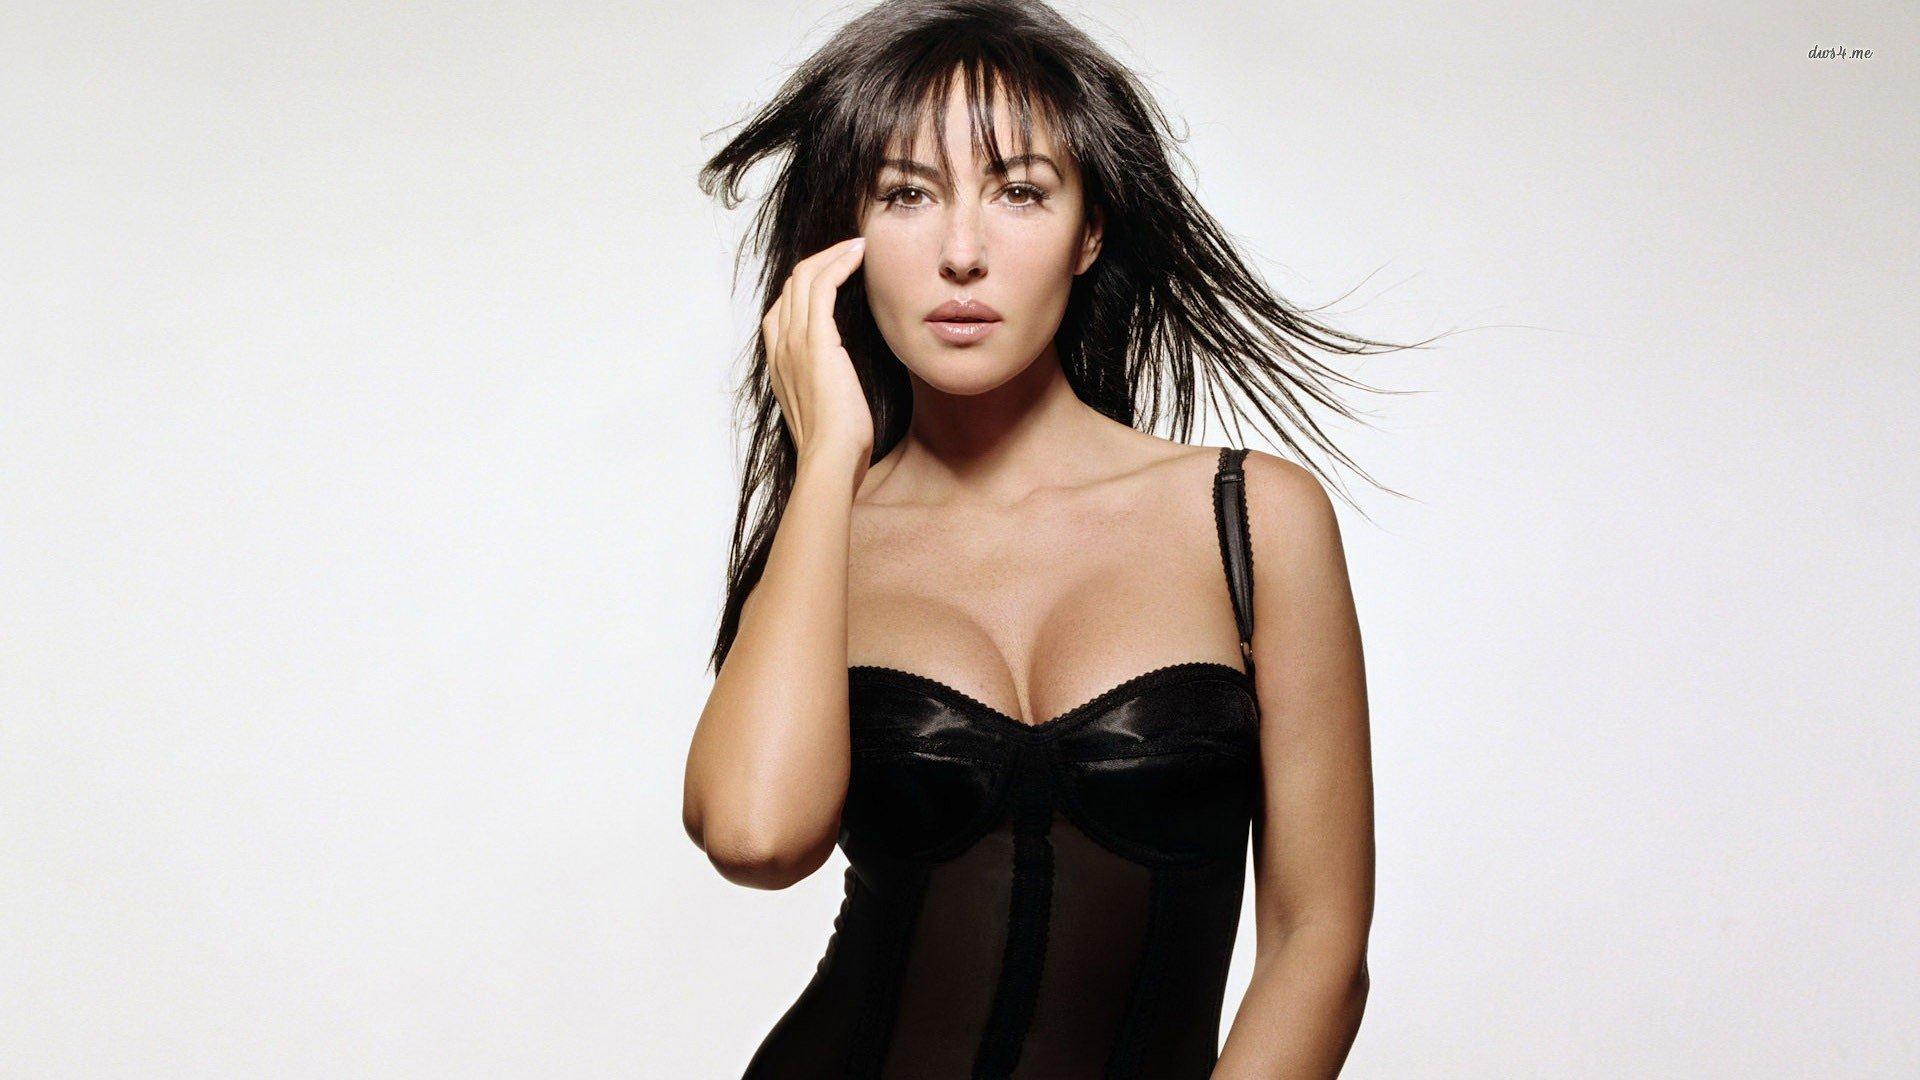 Niki bellucci порно hd онлайн